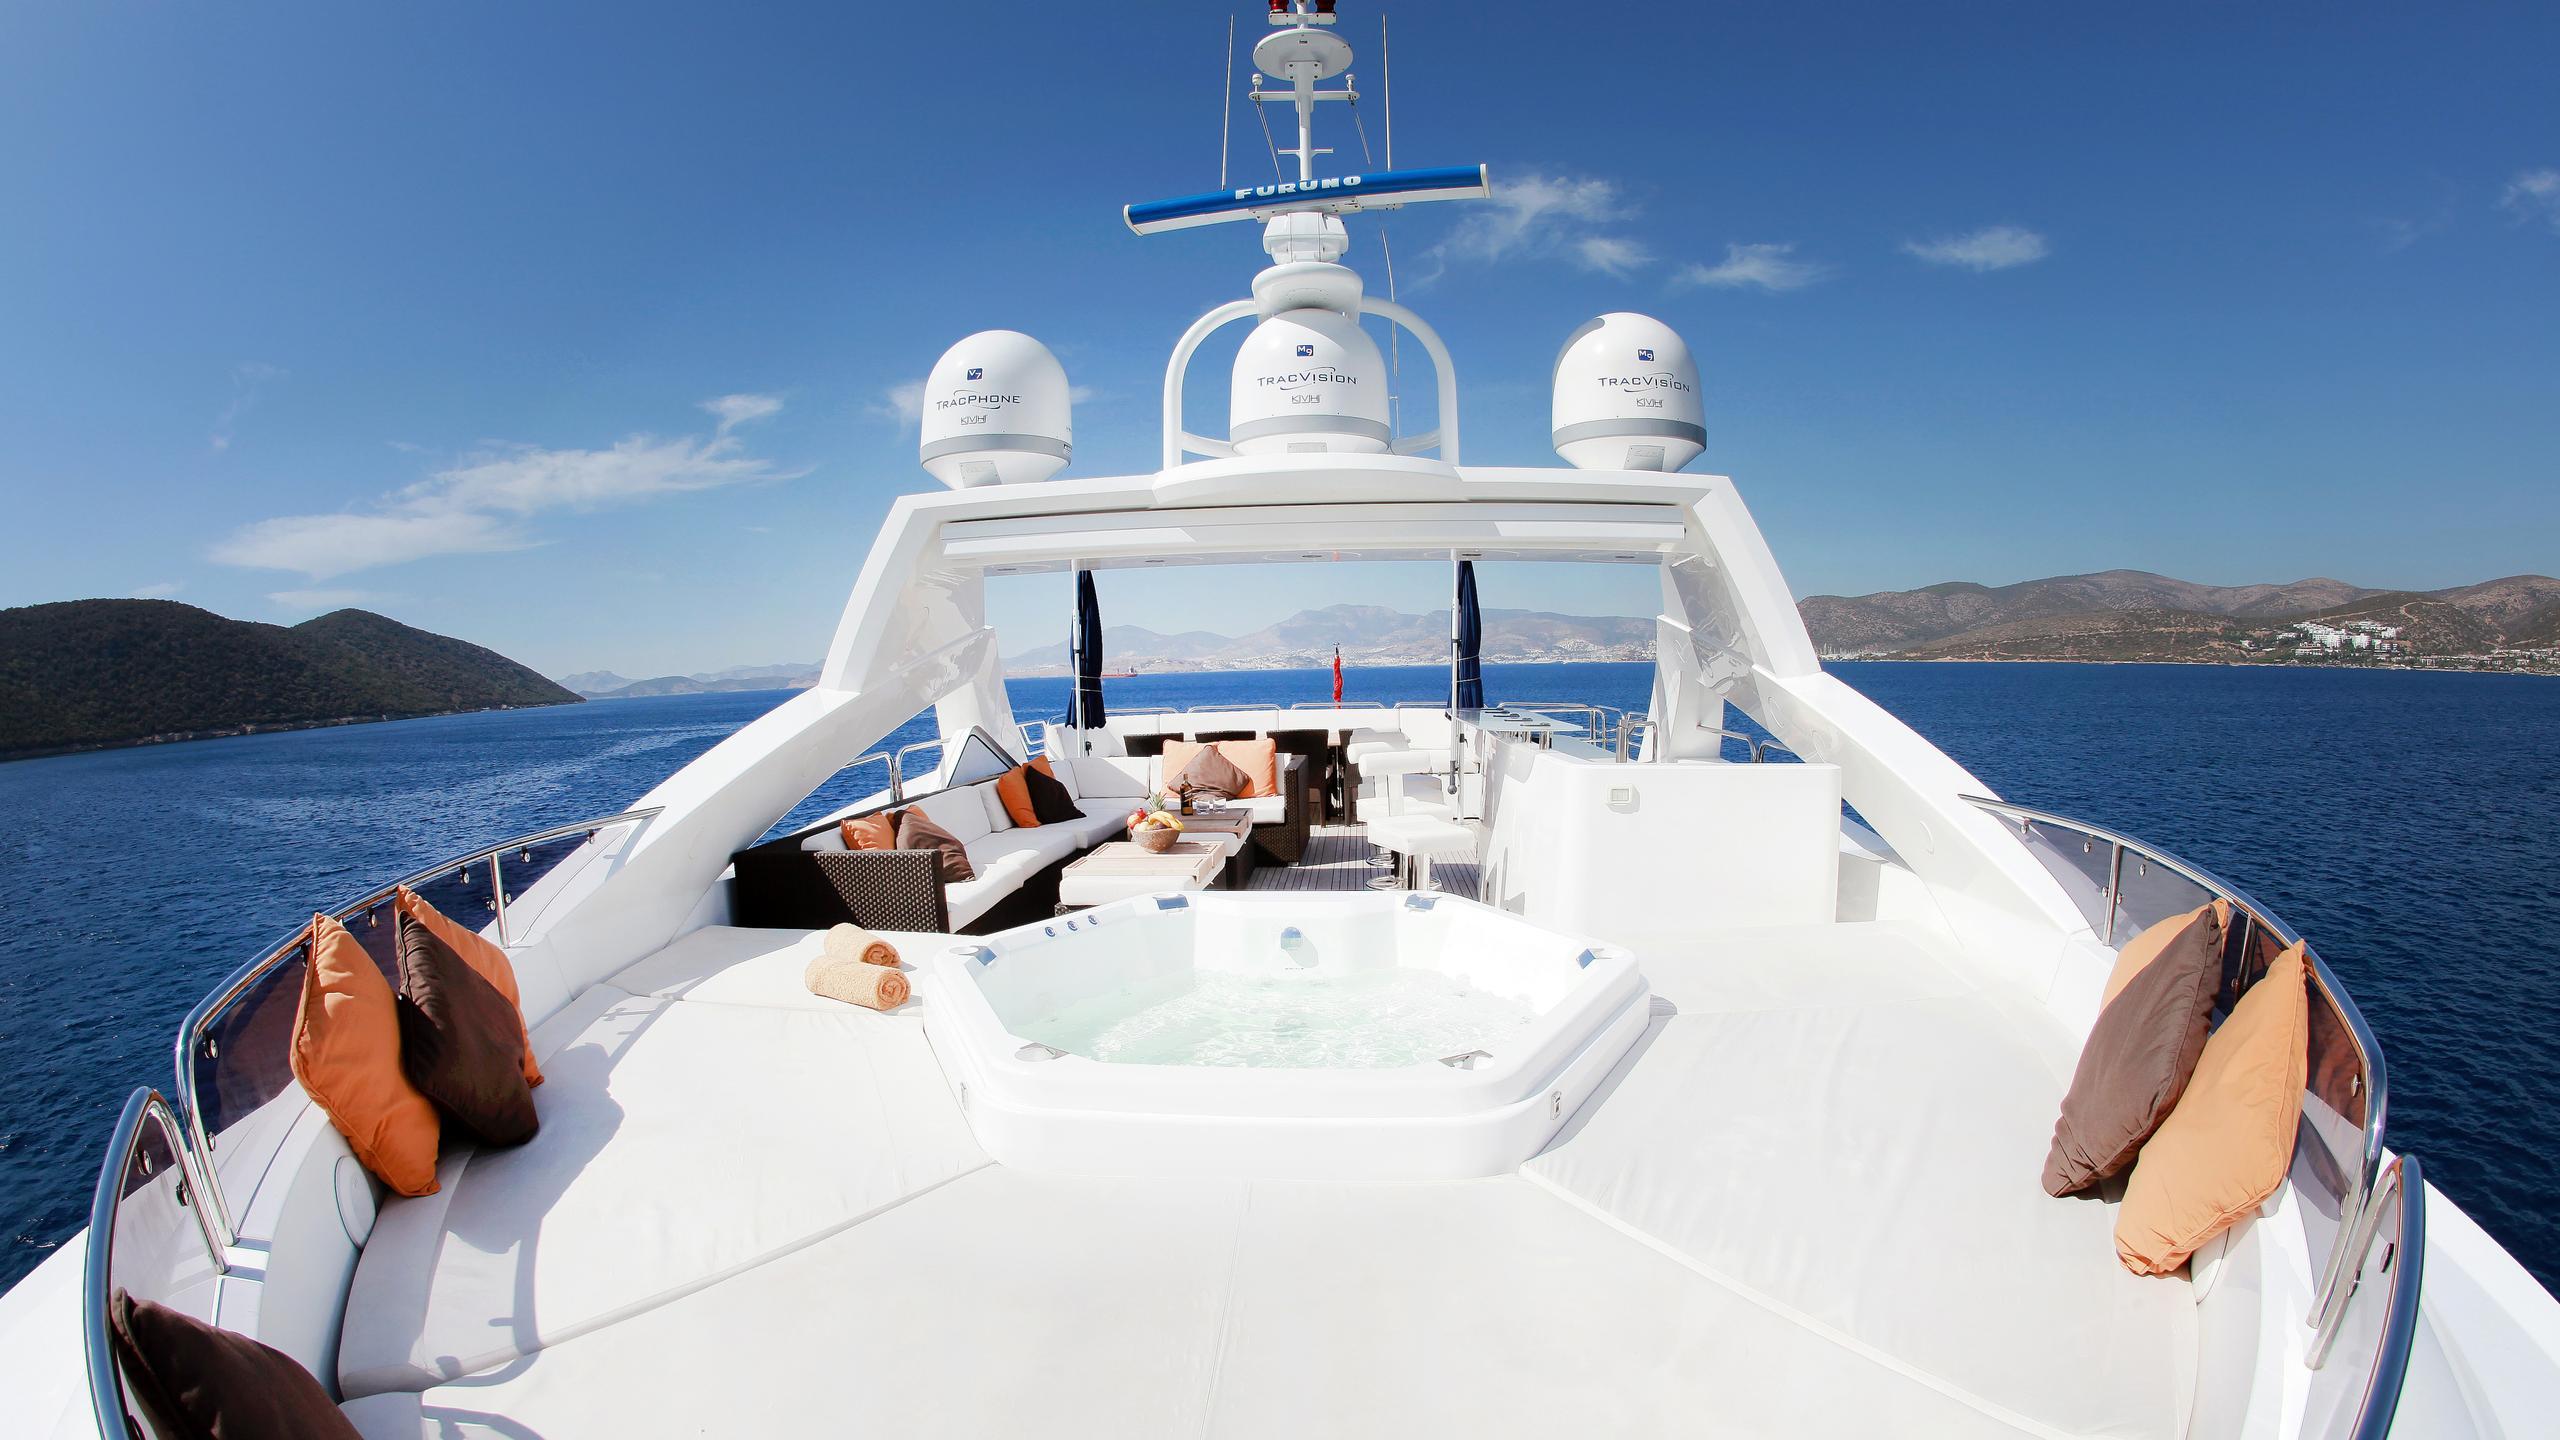 barracuda-red-sea-yacht-sun-deck